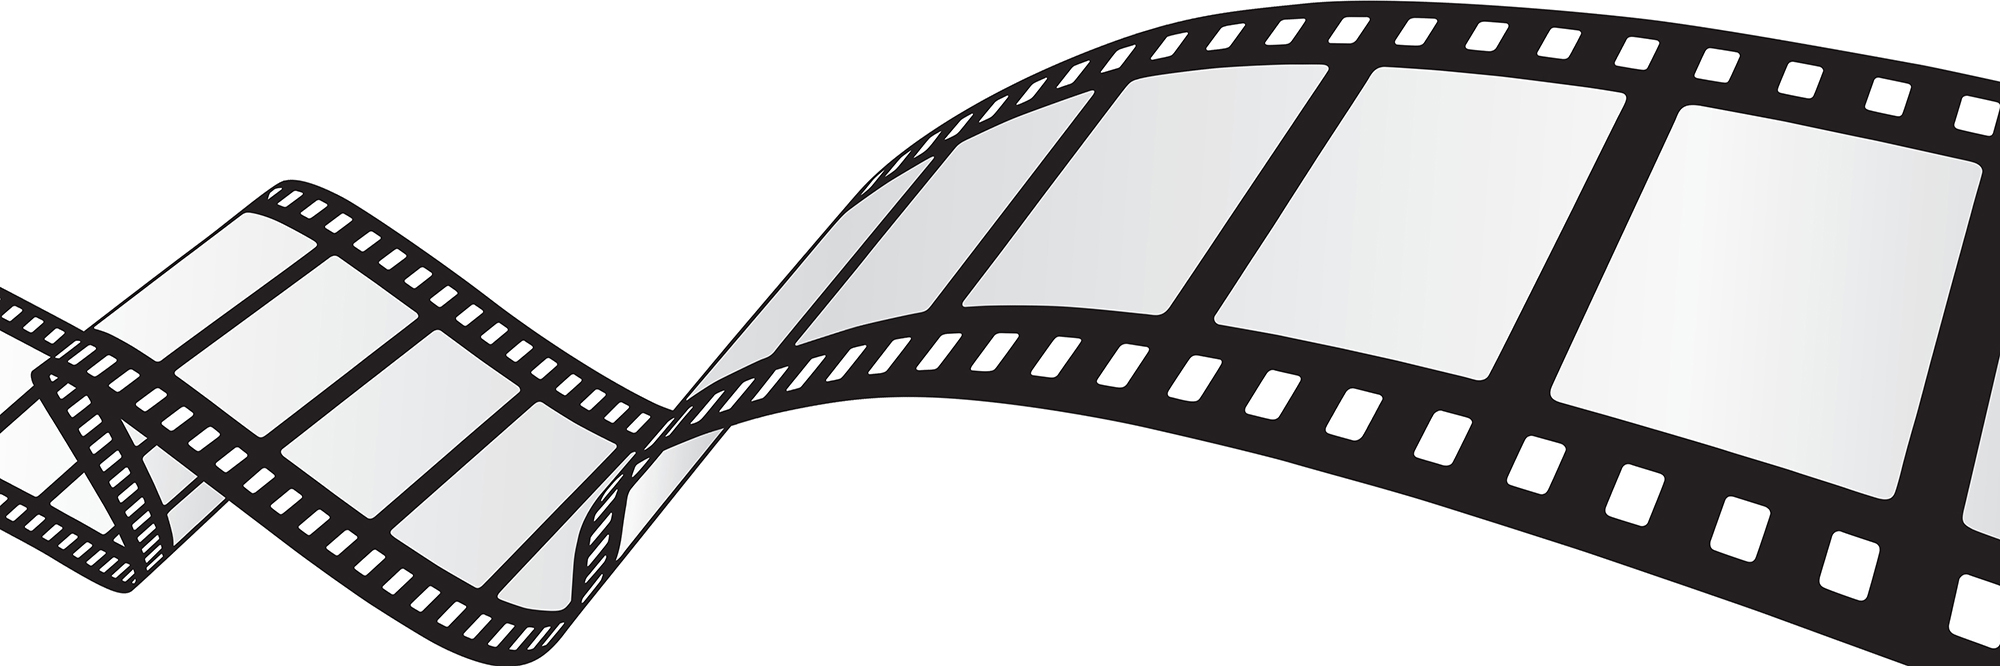 Das Kurzfilm-Kino